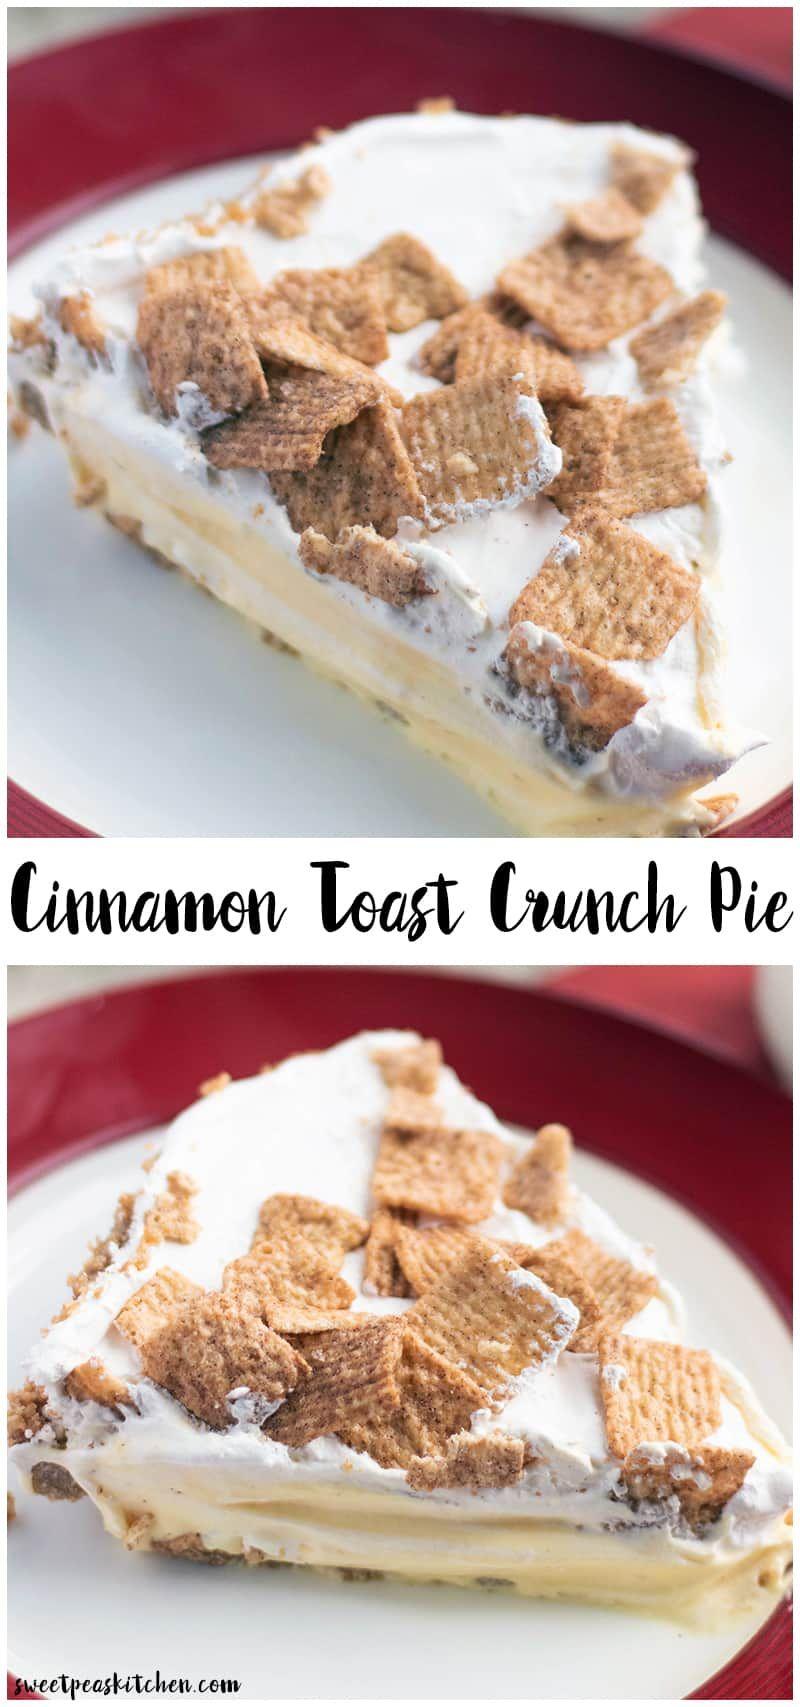 Cinnamon Toast Crunch Pie